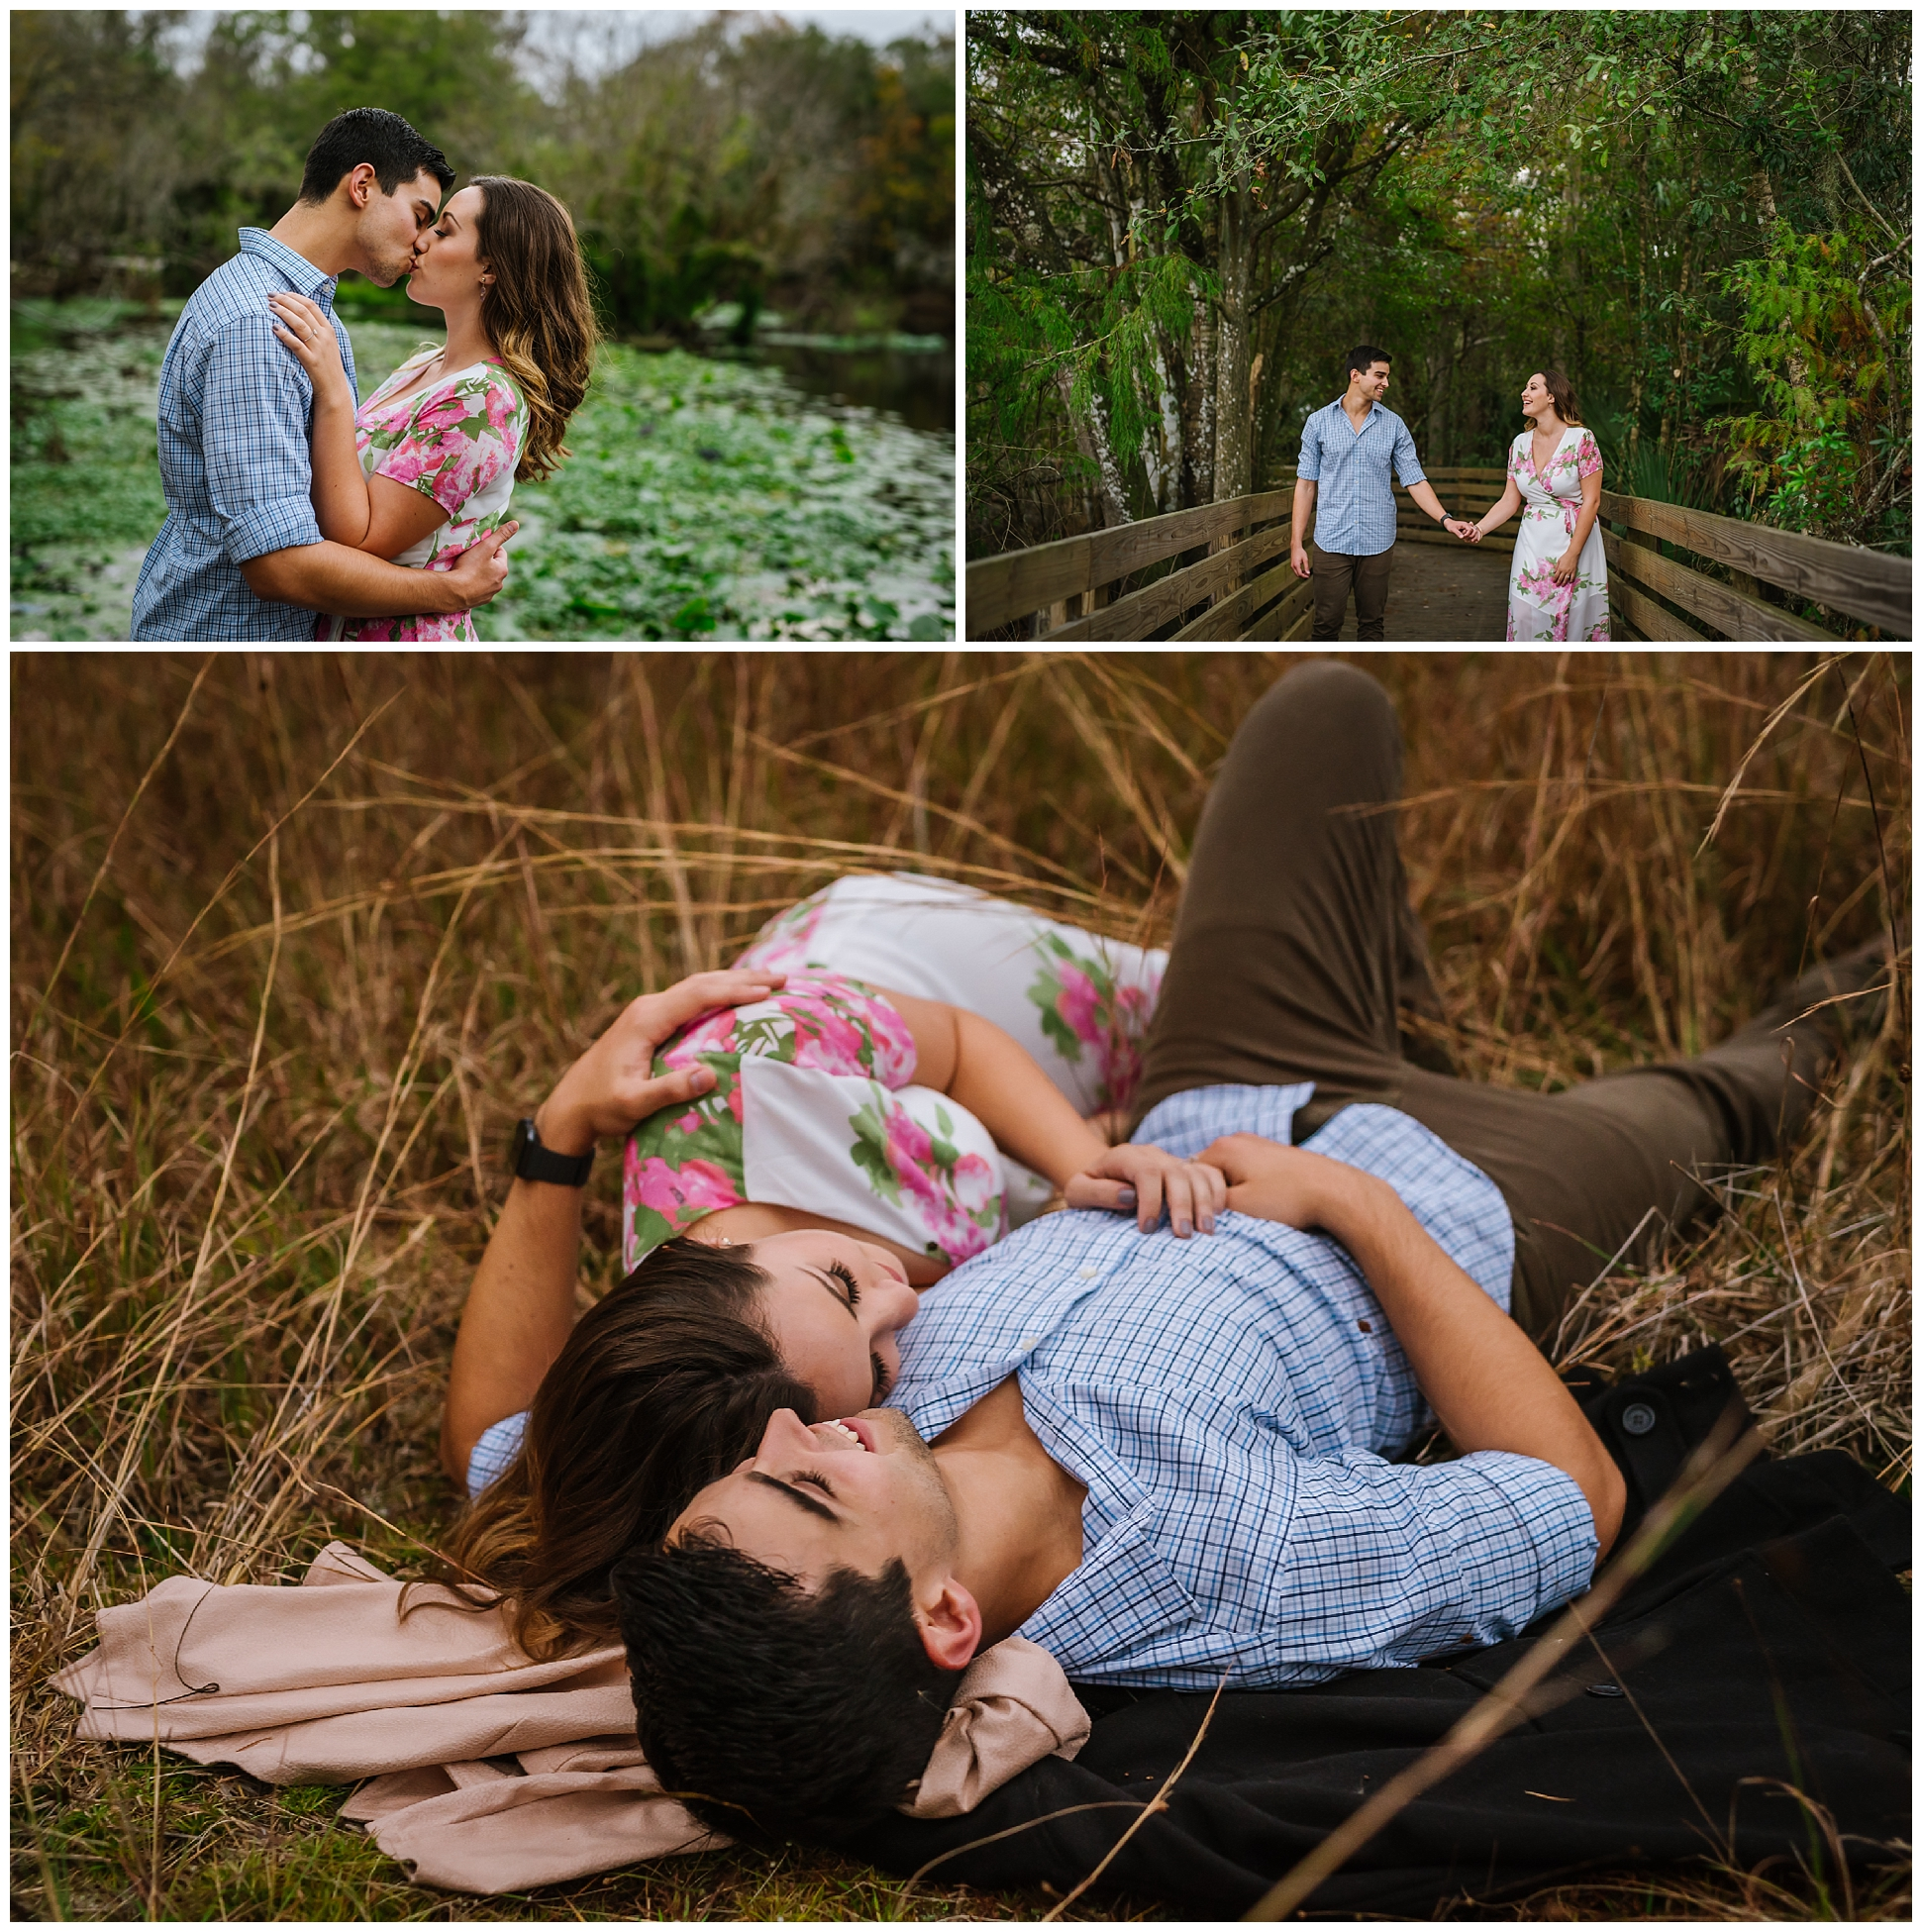 Ashlee-hamon-photography-year-in-review-2016-travel-wanderlust-vsco-adventure-wedding_0062.jpg